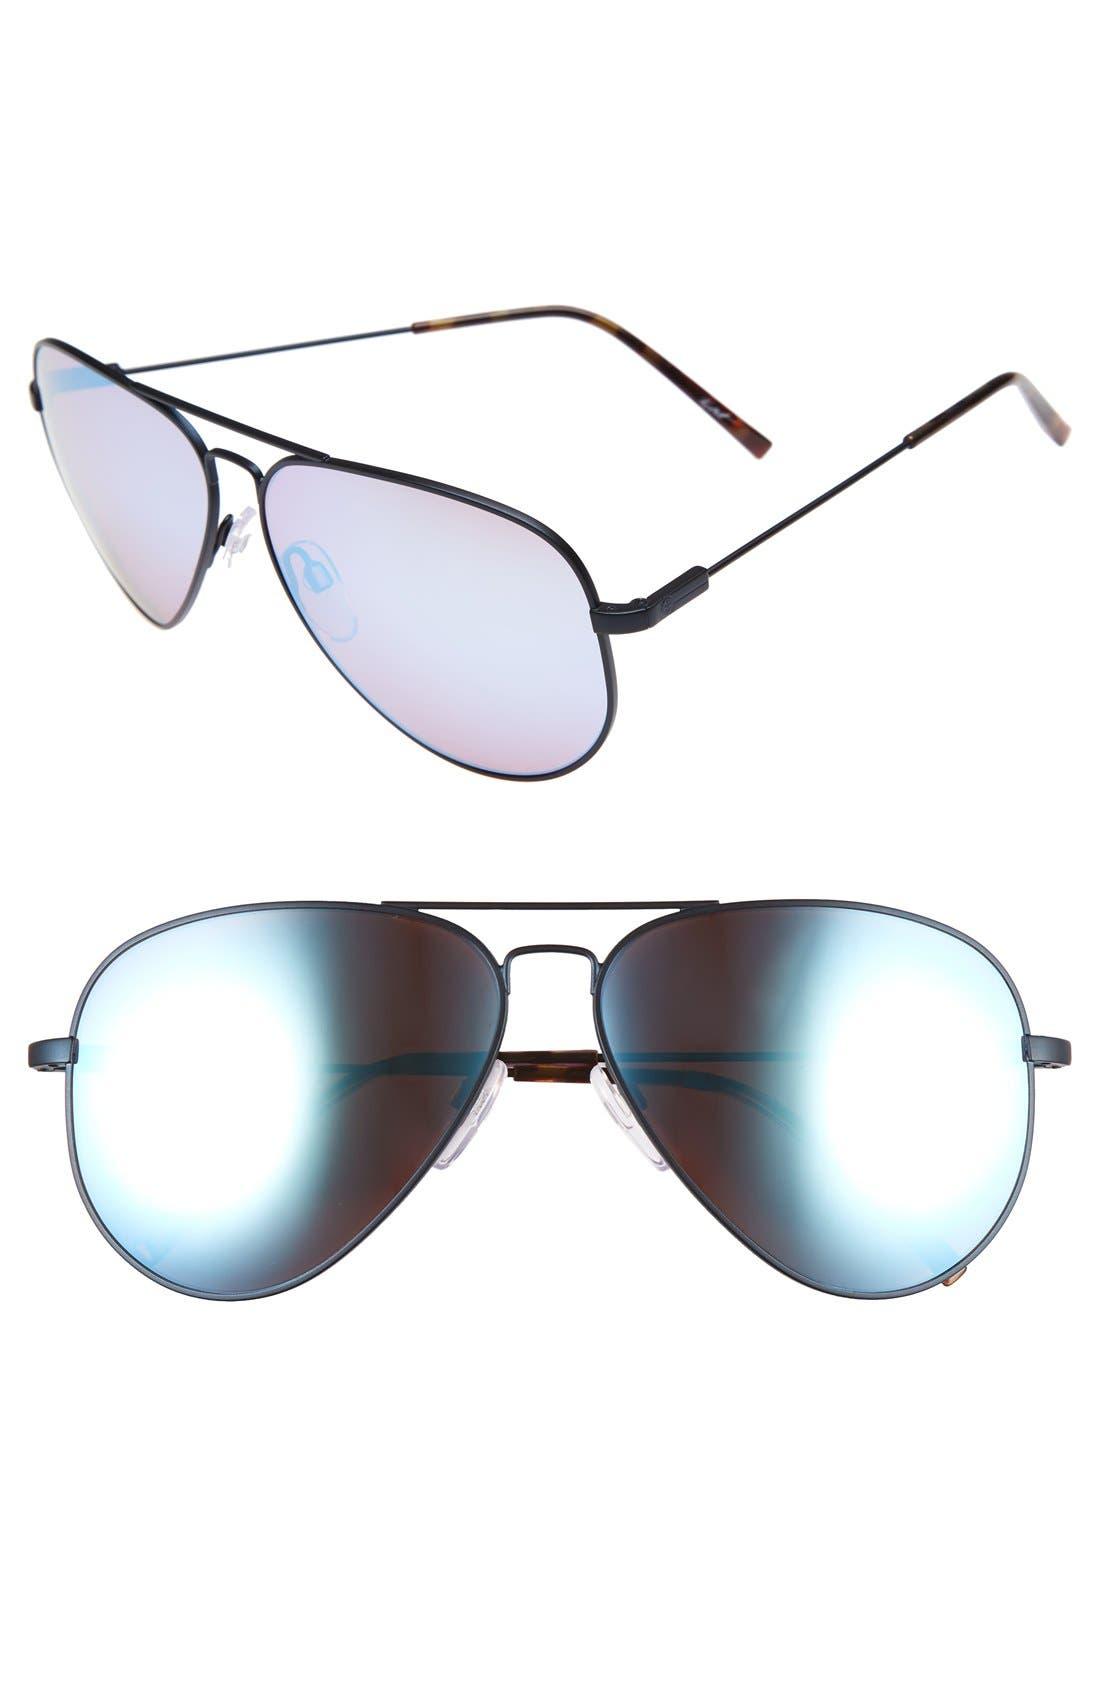 Main Image - ELECTRIC 'AV1 XL' 62mm Aviator Sunglasses